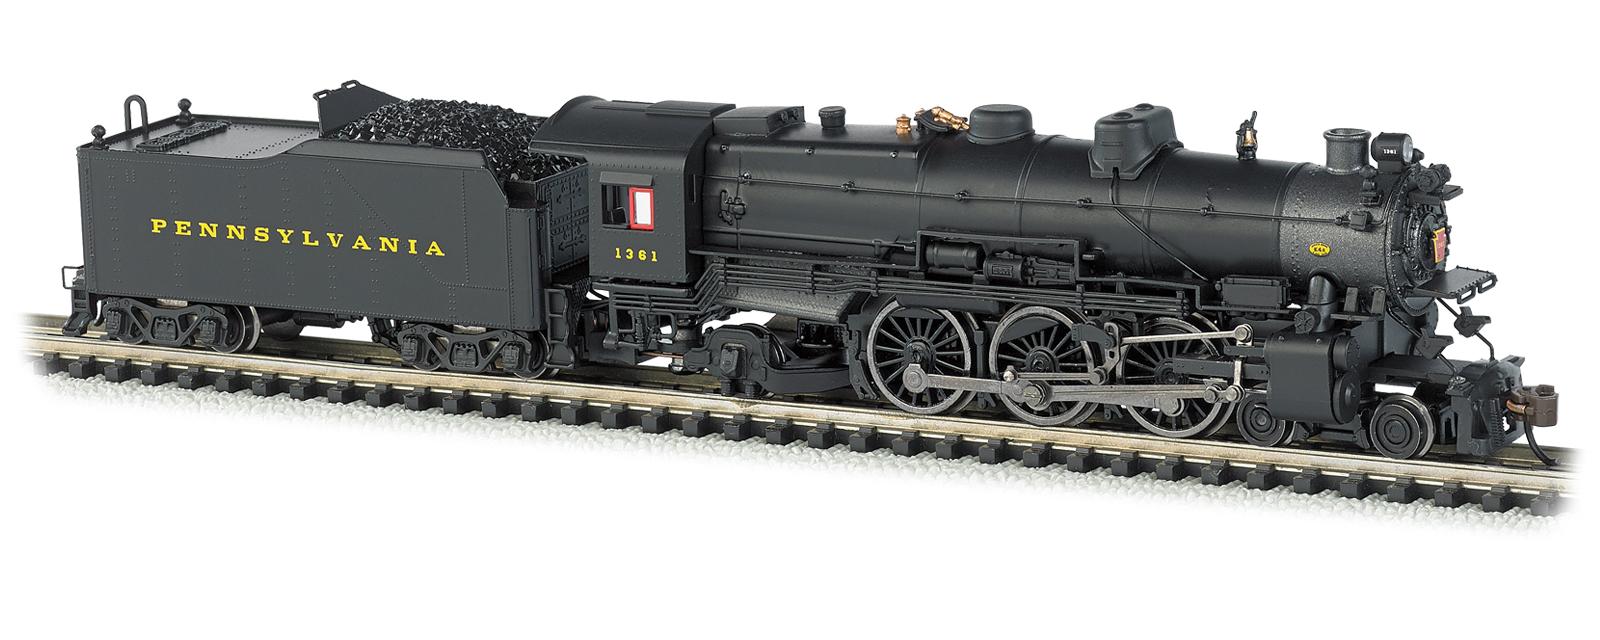 c0797a75e943 Bachmann N Scale Standard Line K4 4-6-2 Steam Locomotive, with ...